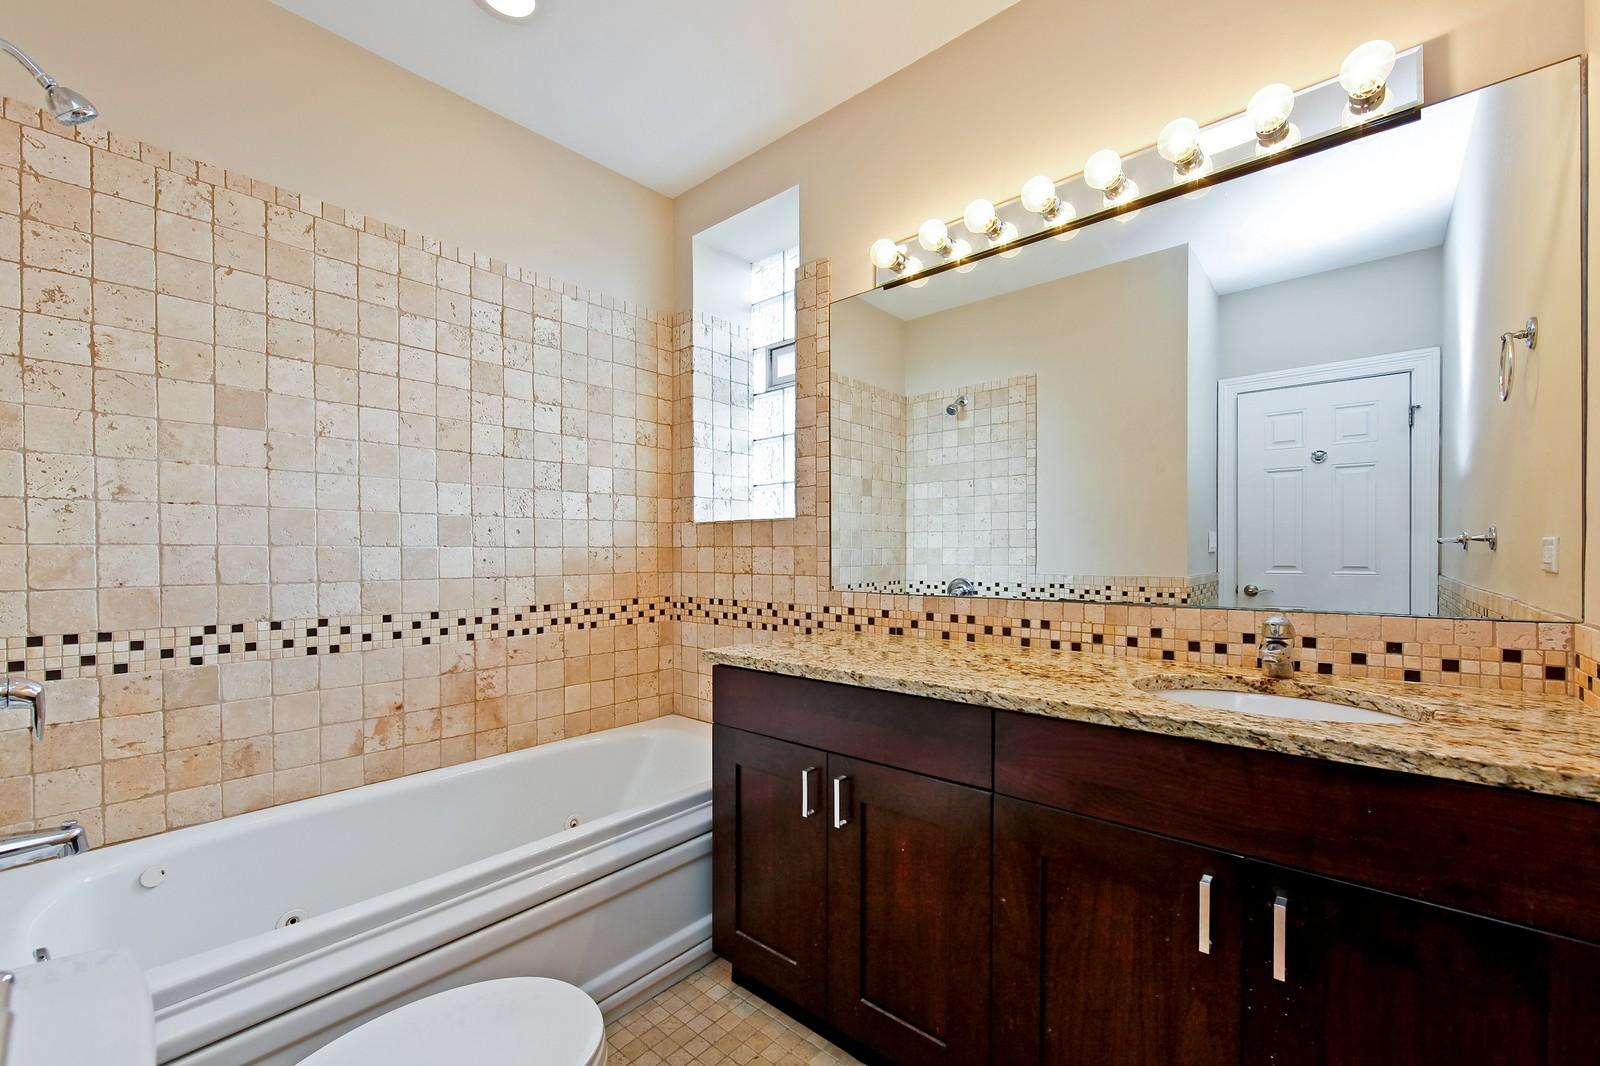 Real Estate Photography - 942 N Fairfield, Unit 1W, Chicago, IL, 60622 - Bathroom